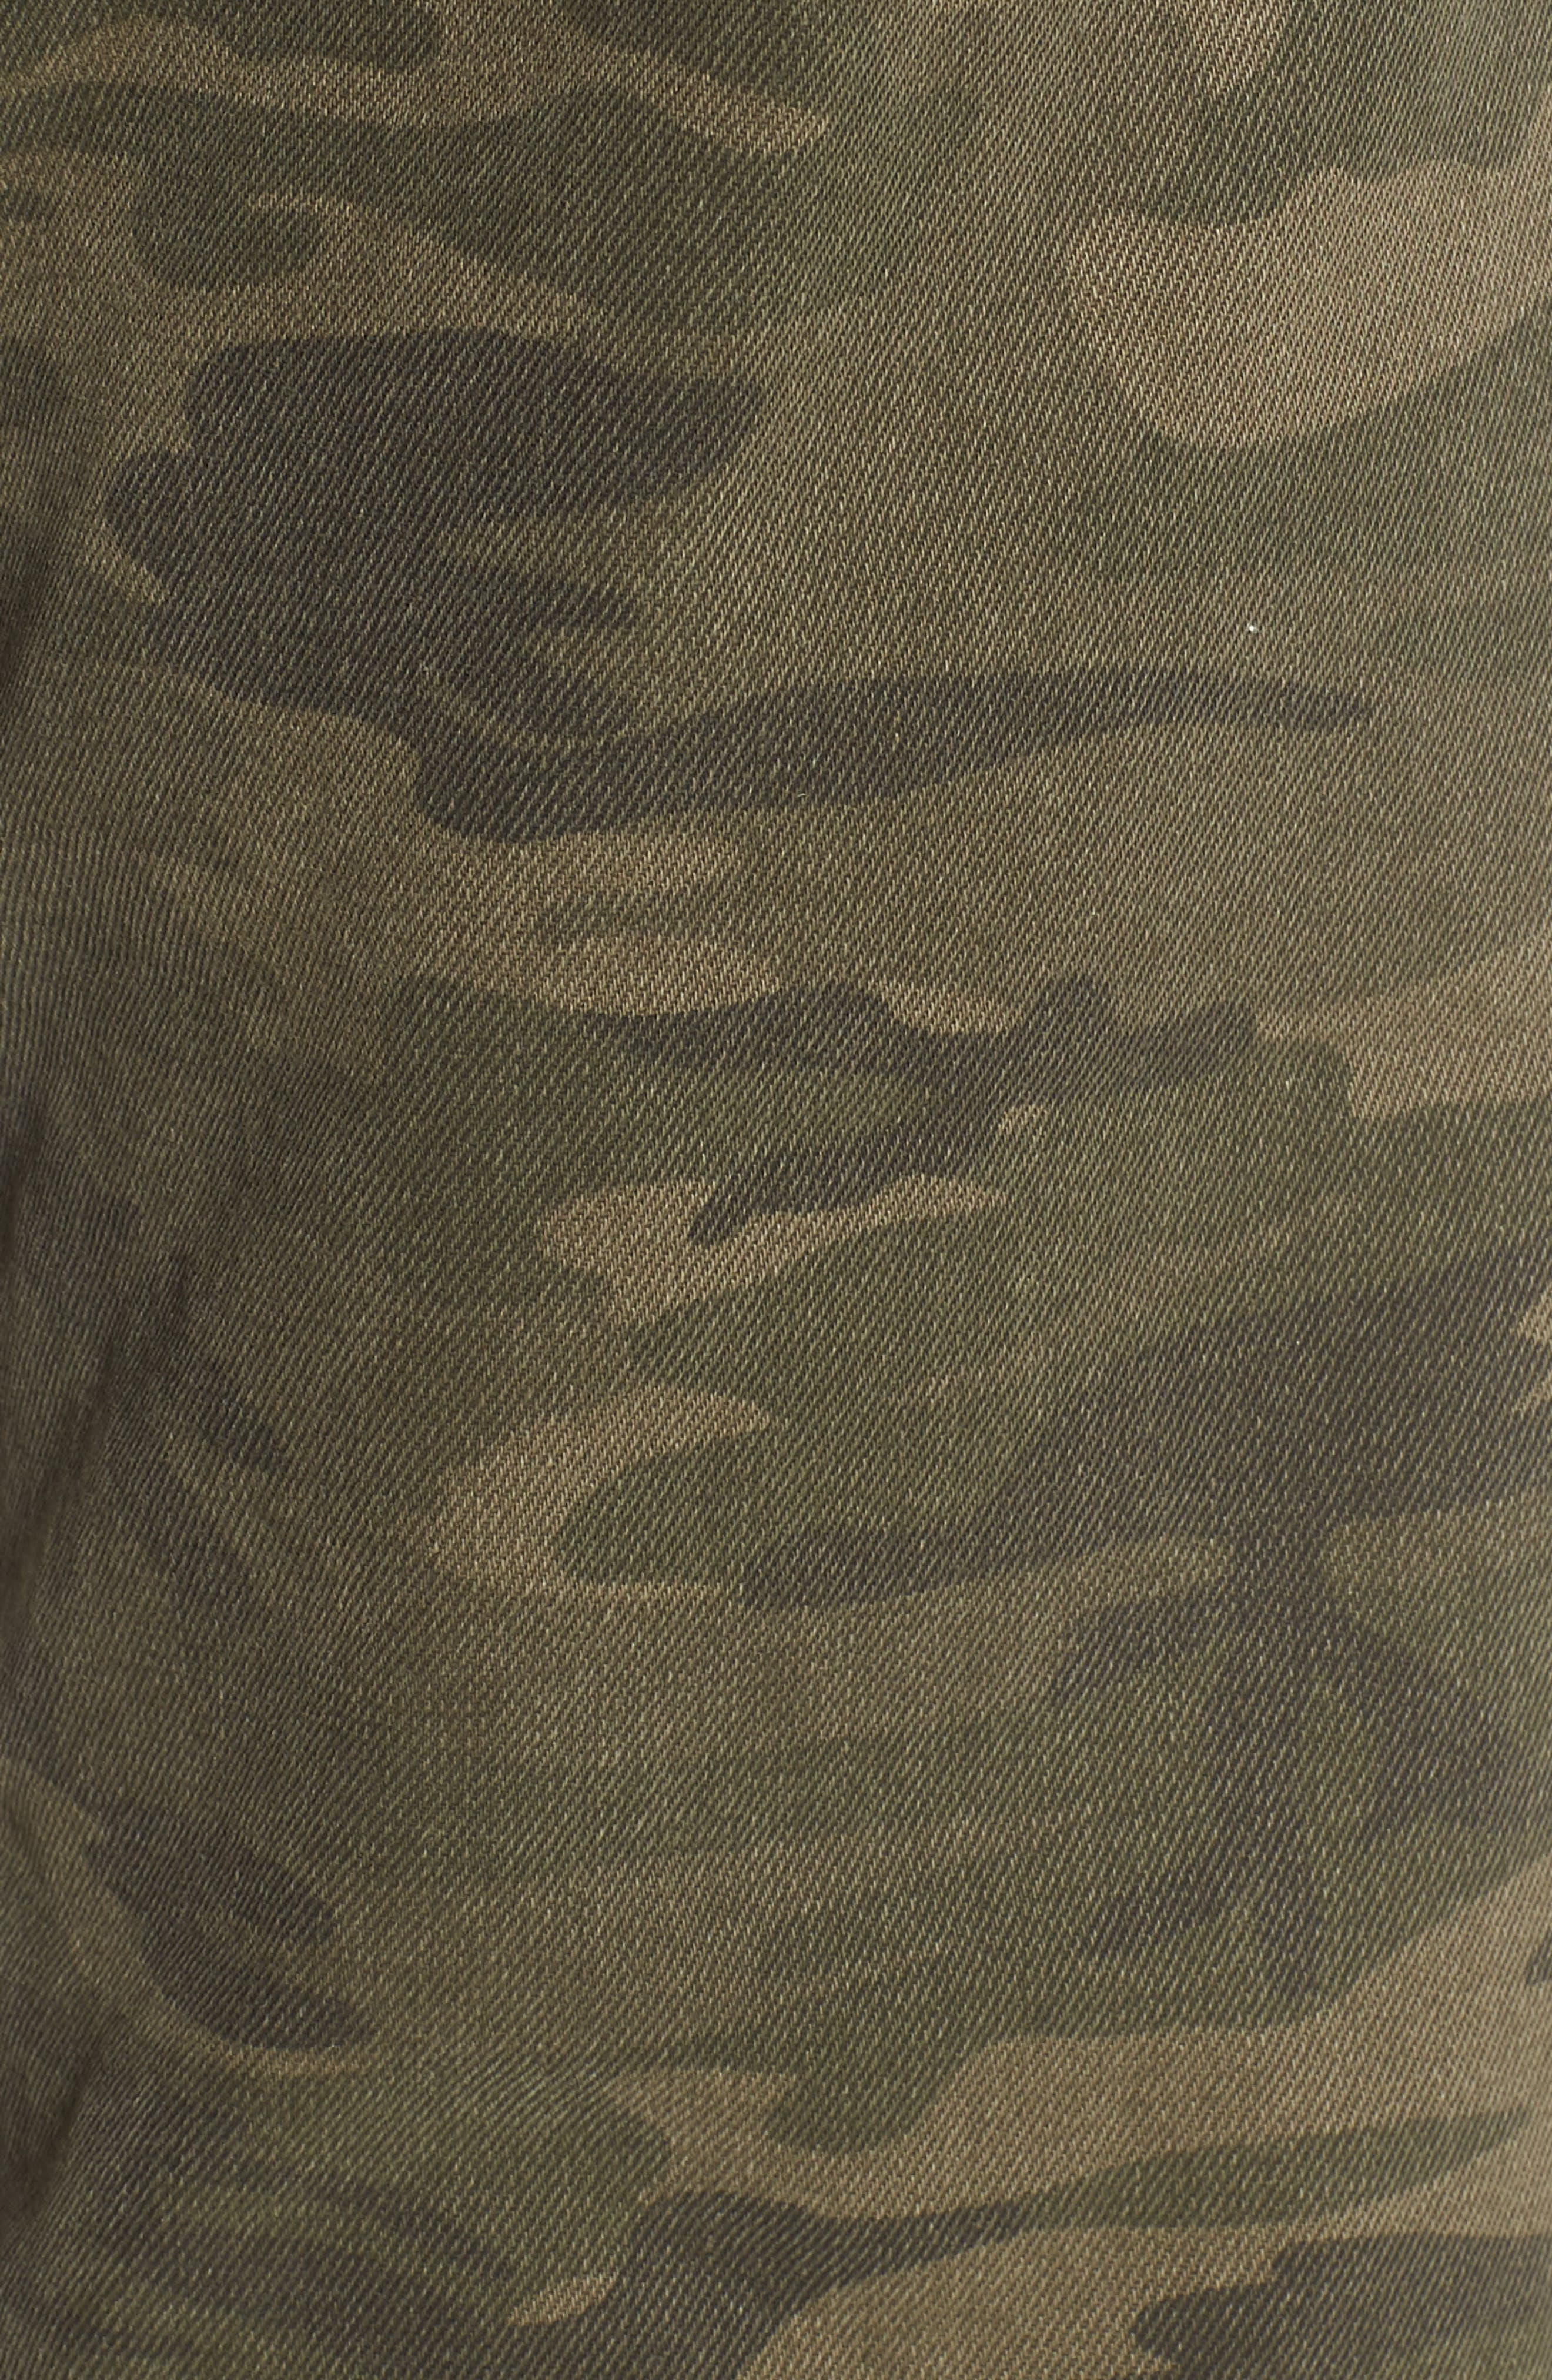 Camo Wide Leg Trousers,                             Alternate thumbnail 6, color,                             Olive